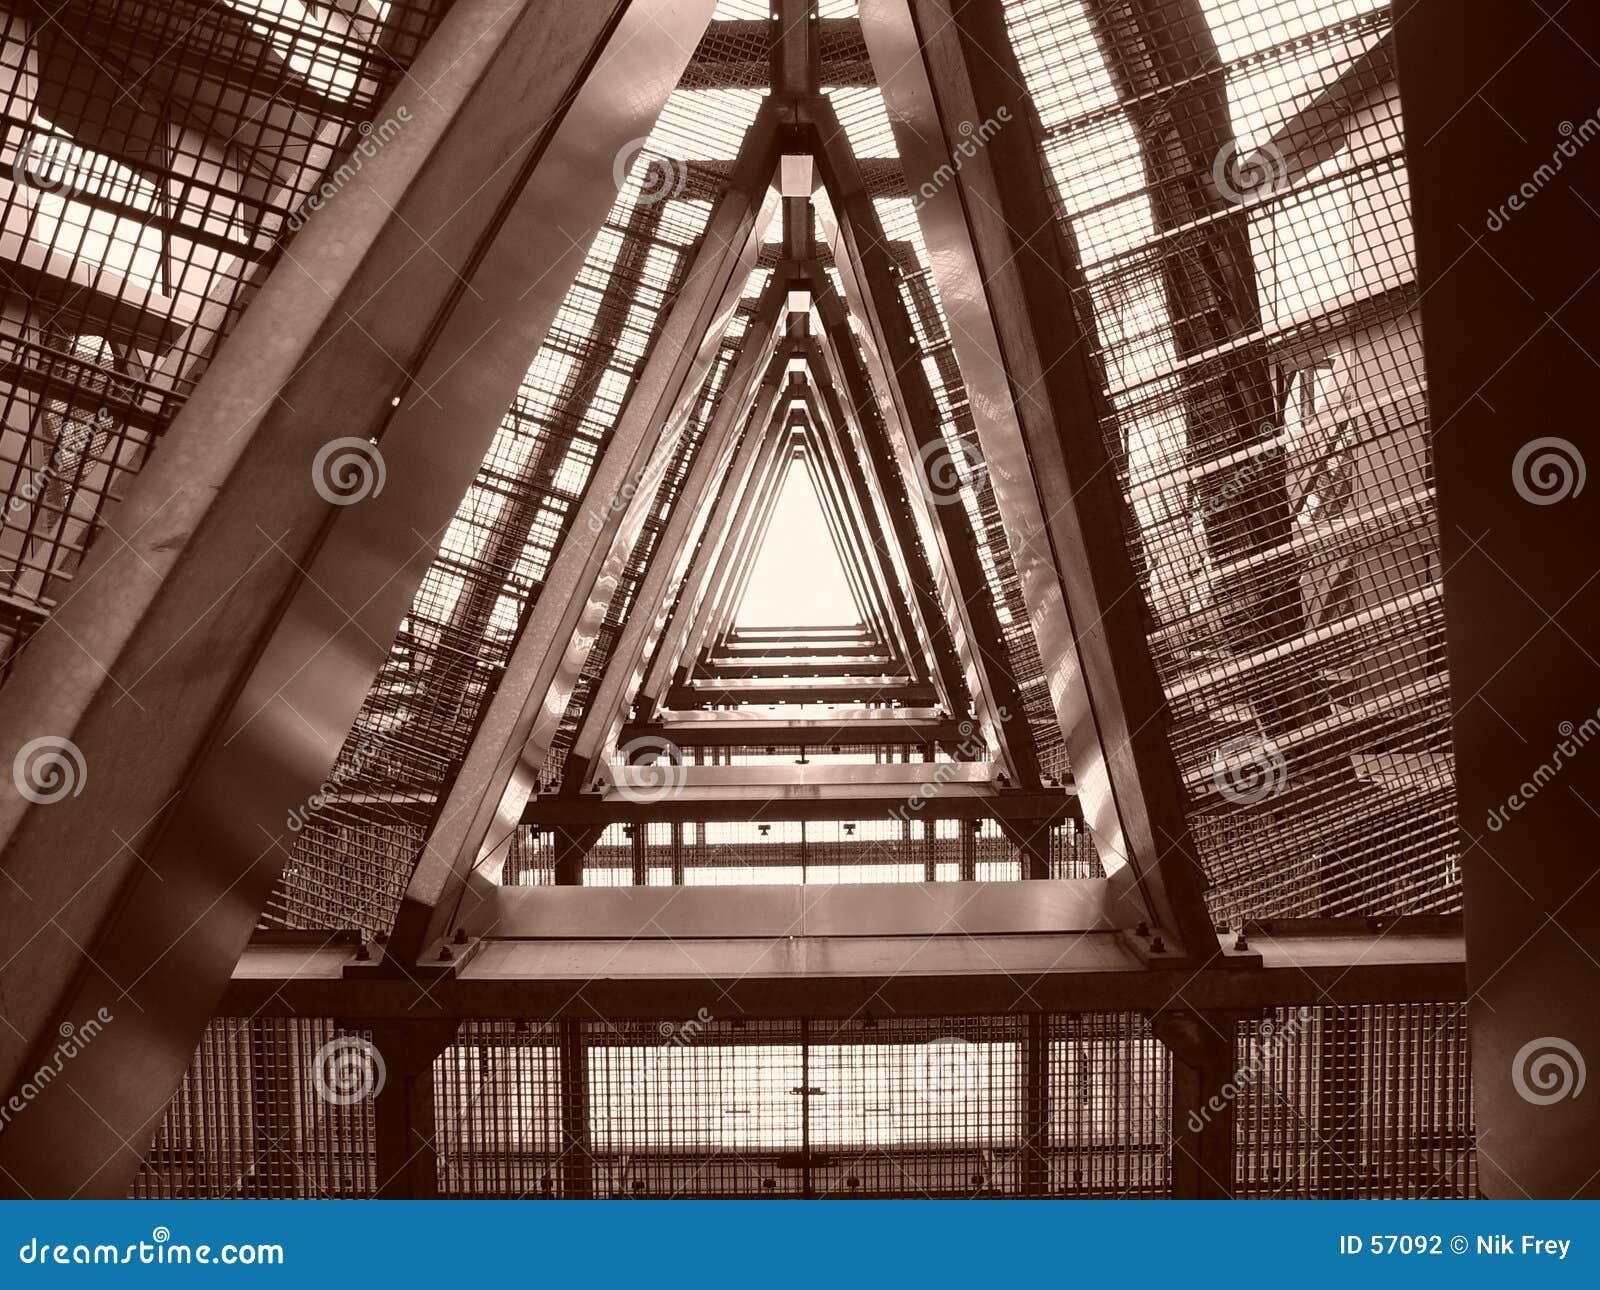 Download σκαλοπάτια στοκ εικόνες. εικόνα από δίκτυο, καθαρός, αρχιτεκτονικής - 57092